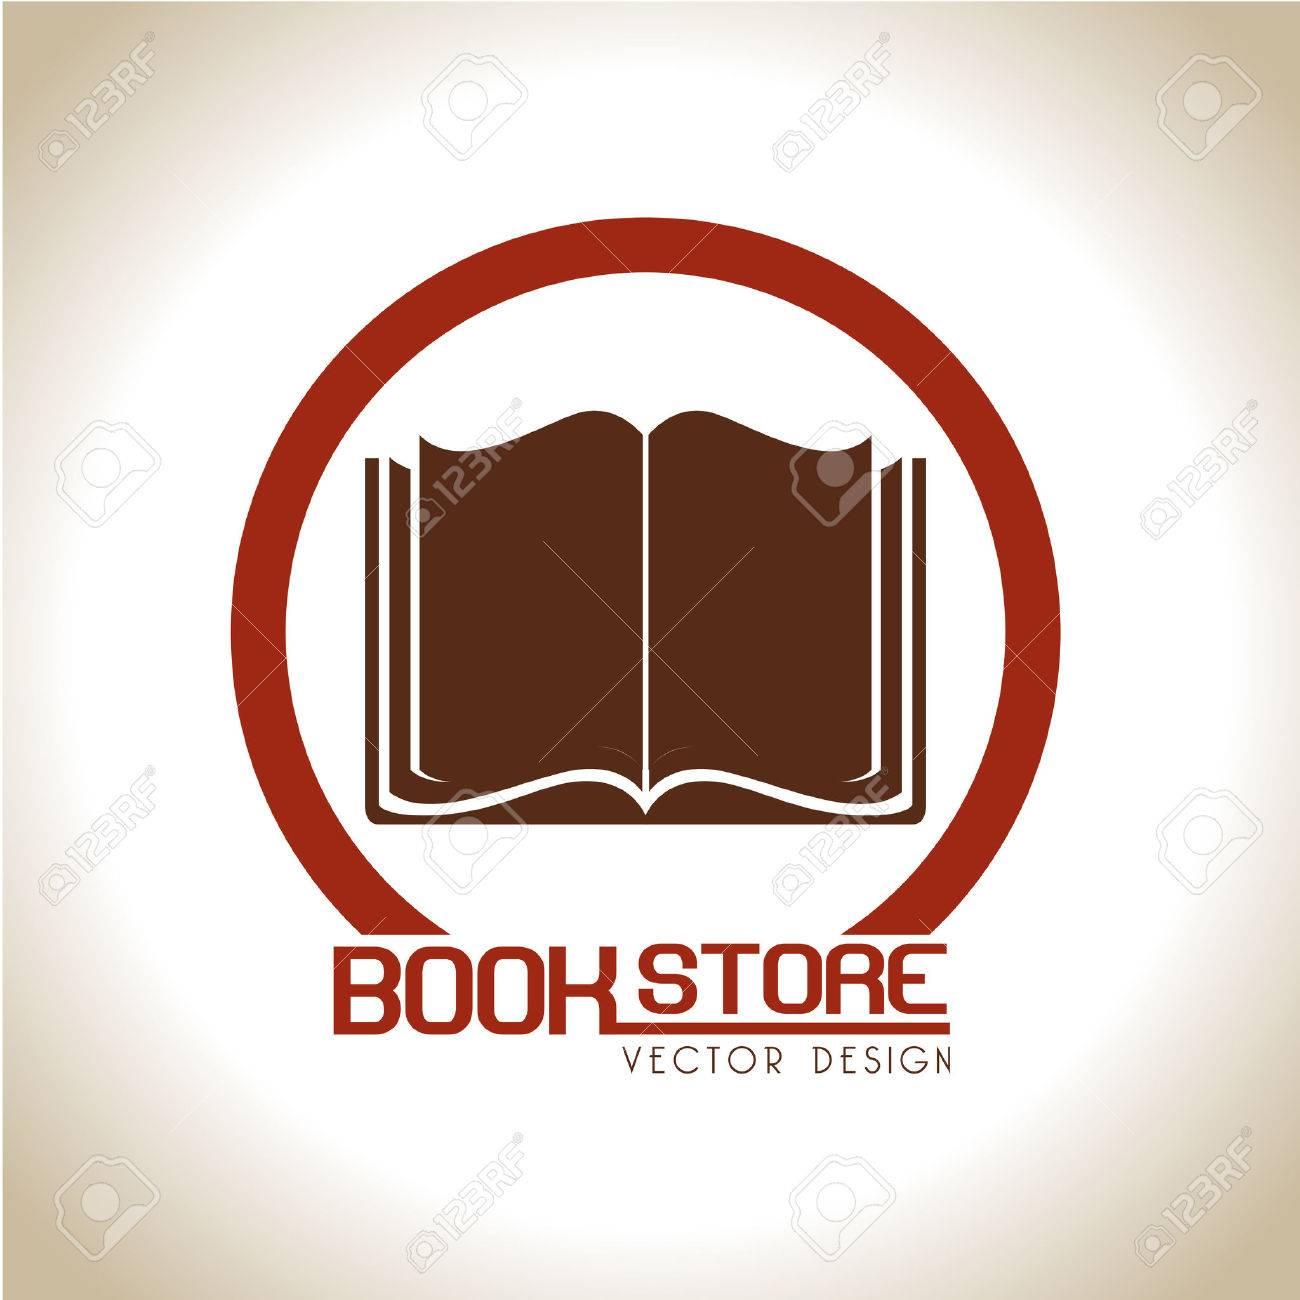 book store over beige background vector illustration Stock Vector - 22333978